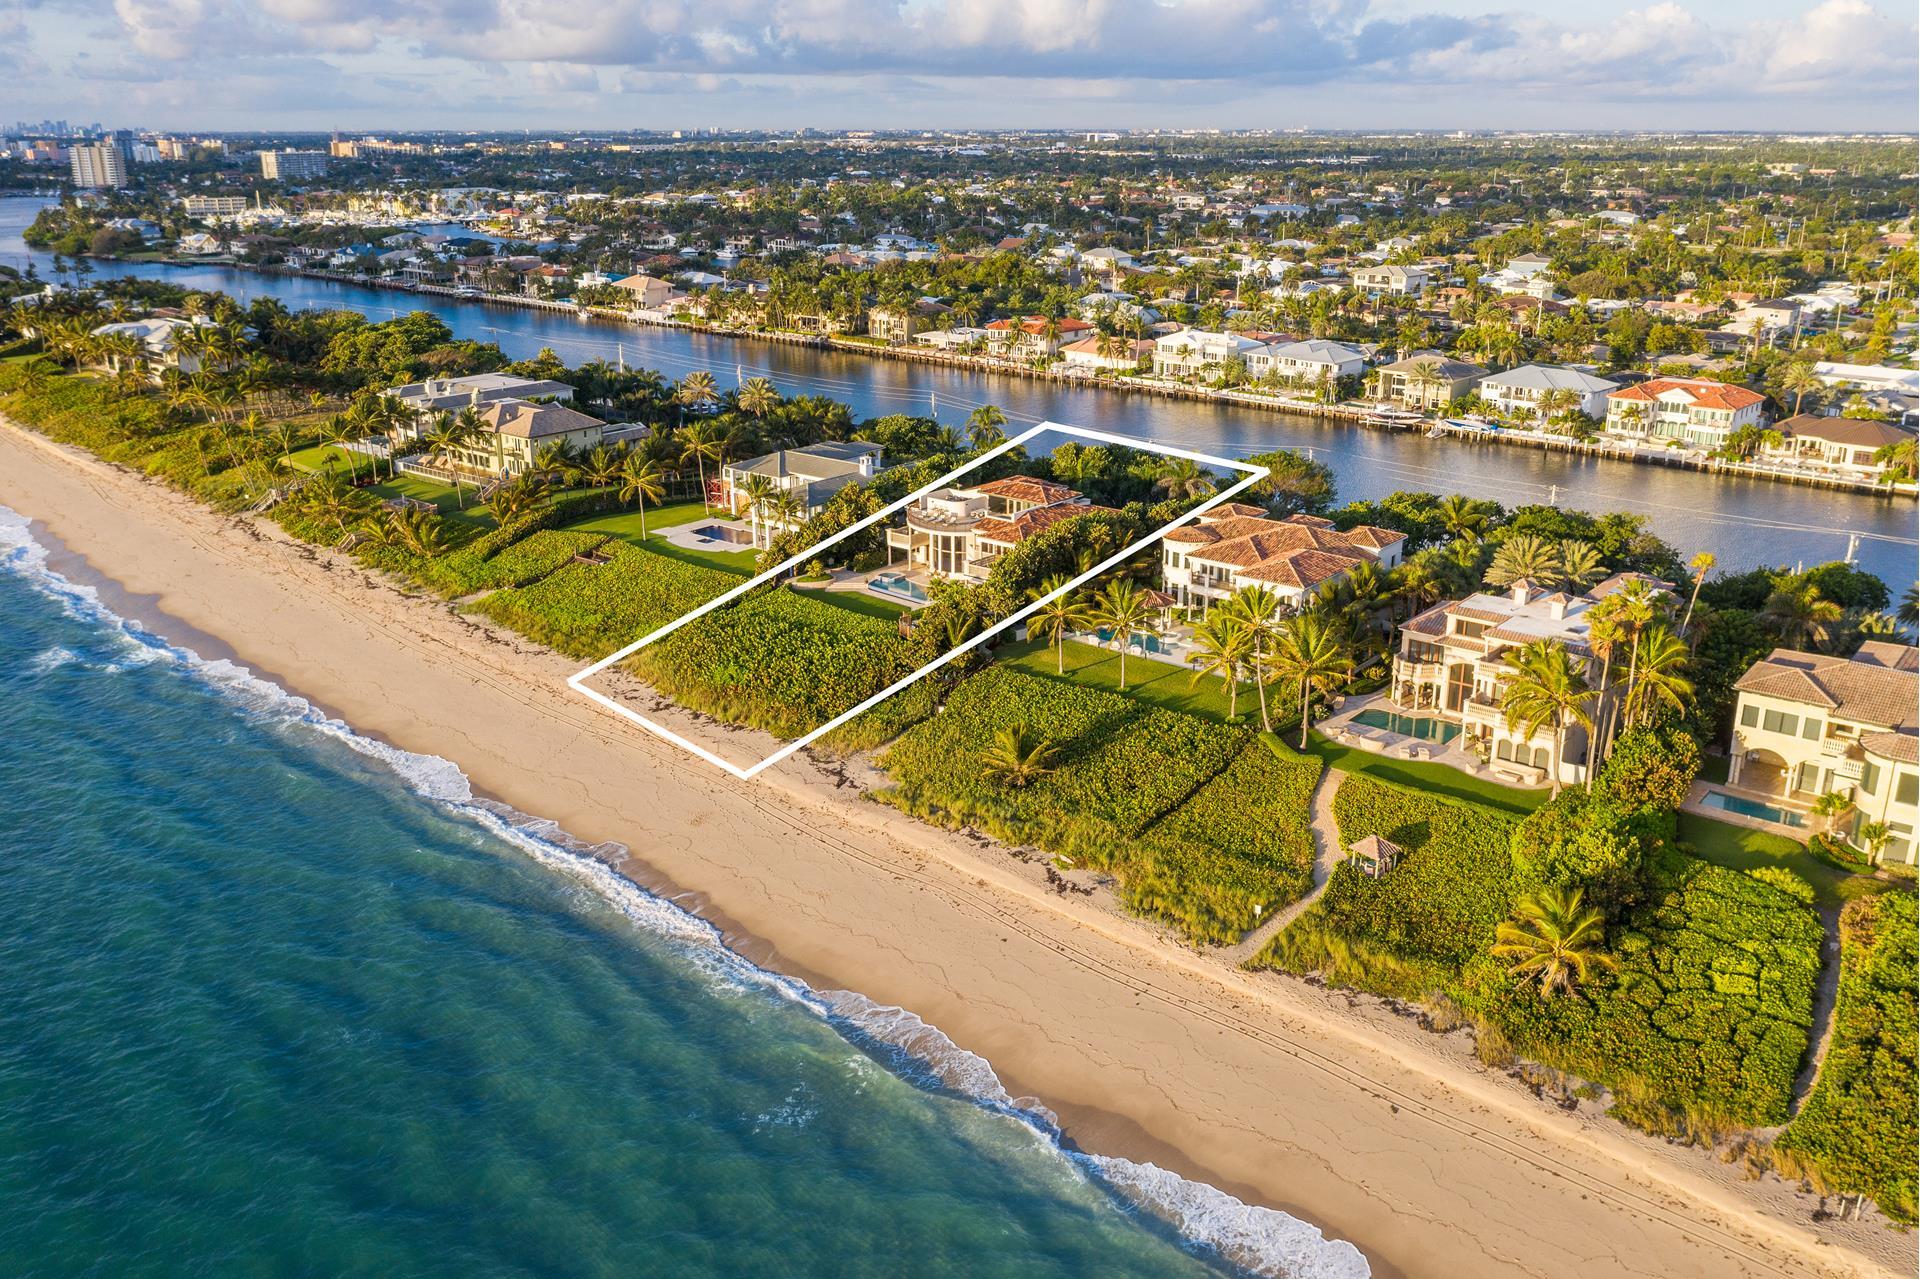 1009 Hillsboro Mile - Hillsboro Beach, Florida